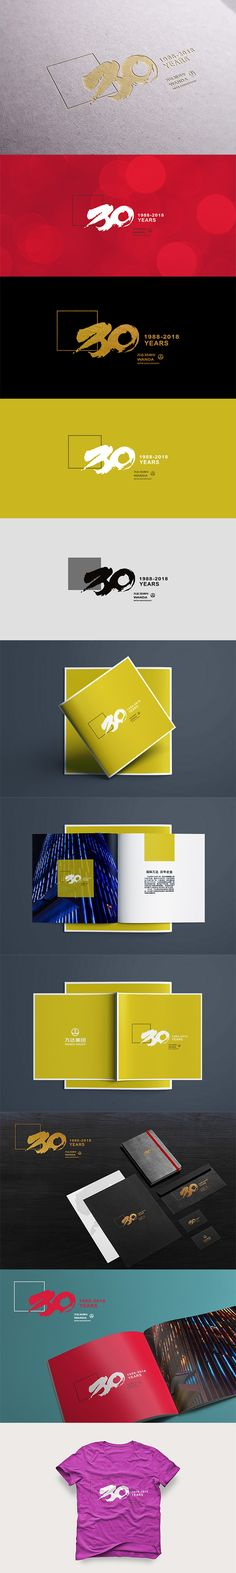 WANDA 30th anniversary logo design …